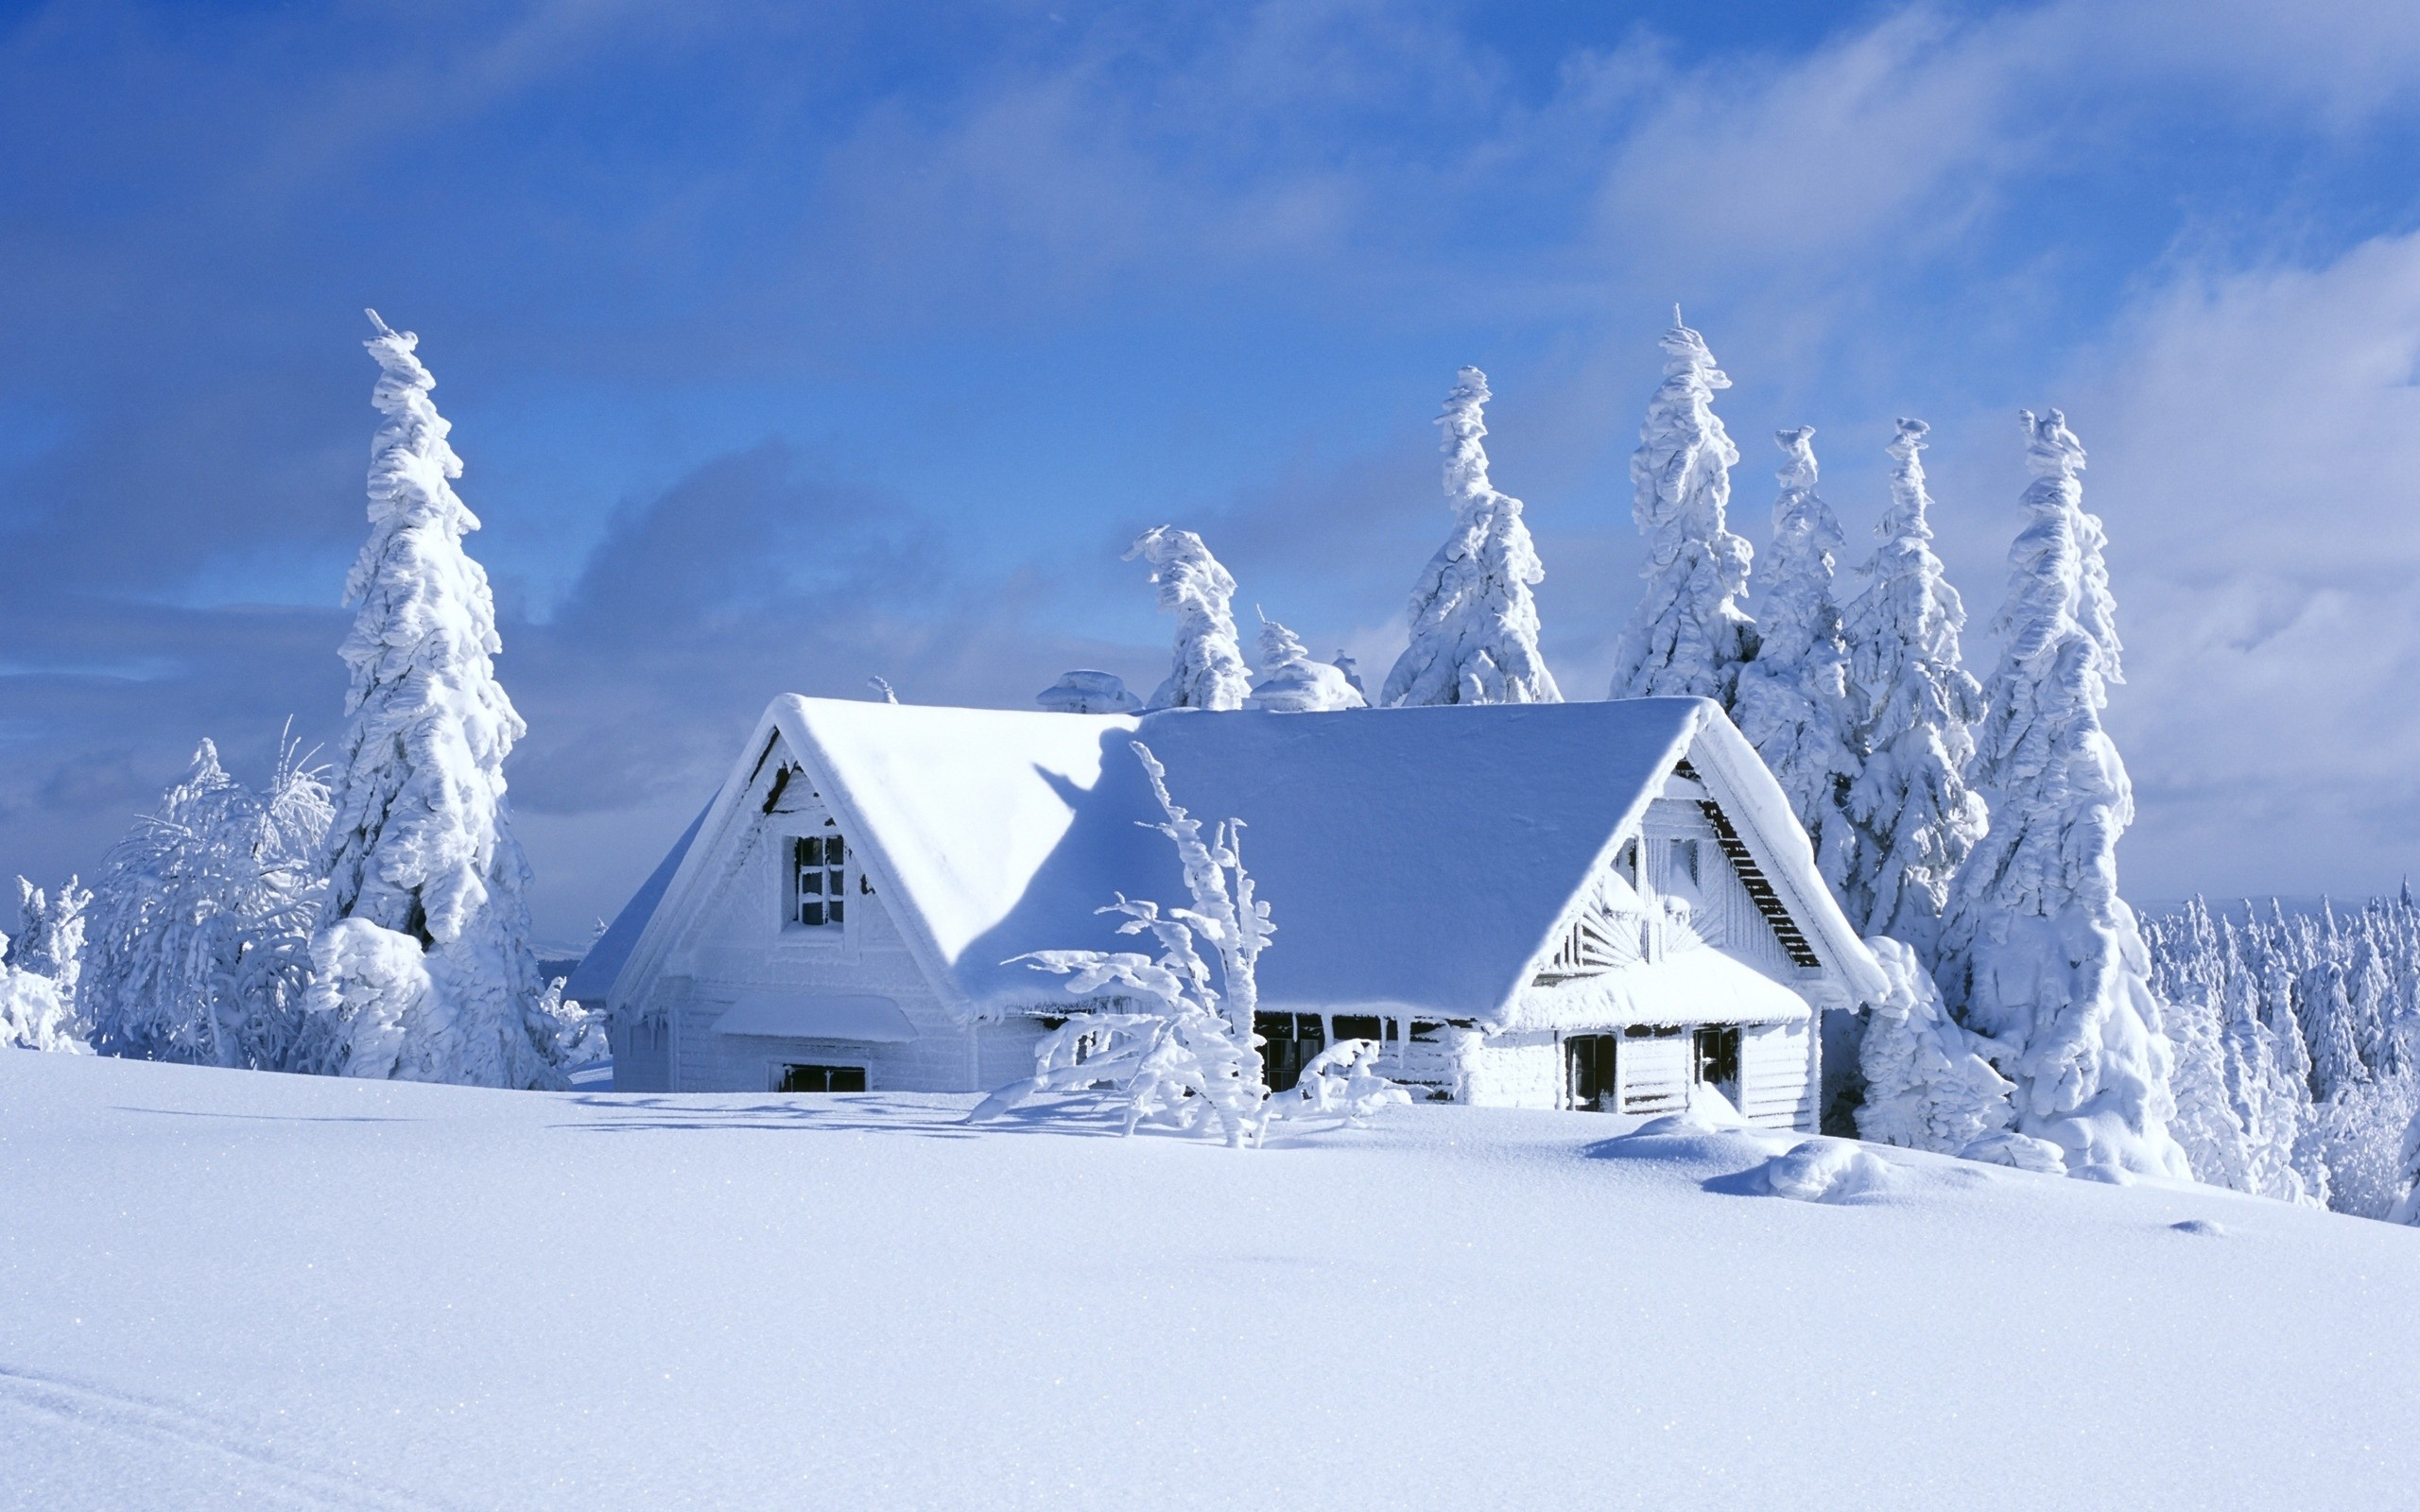 House-Covered-In-Snow-desktop-wallpaper